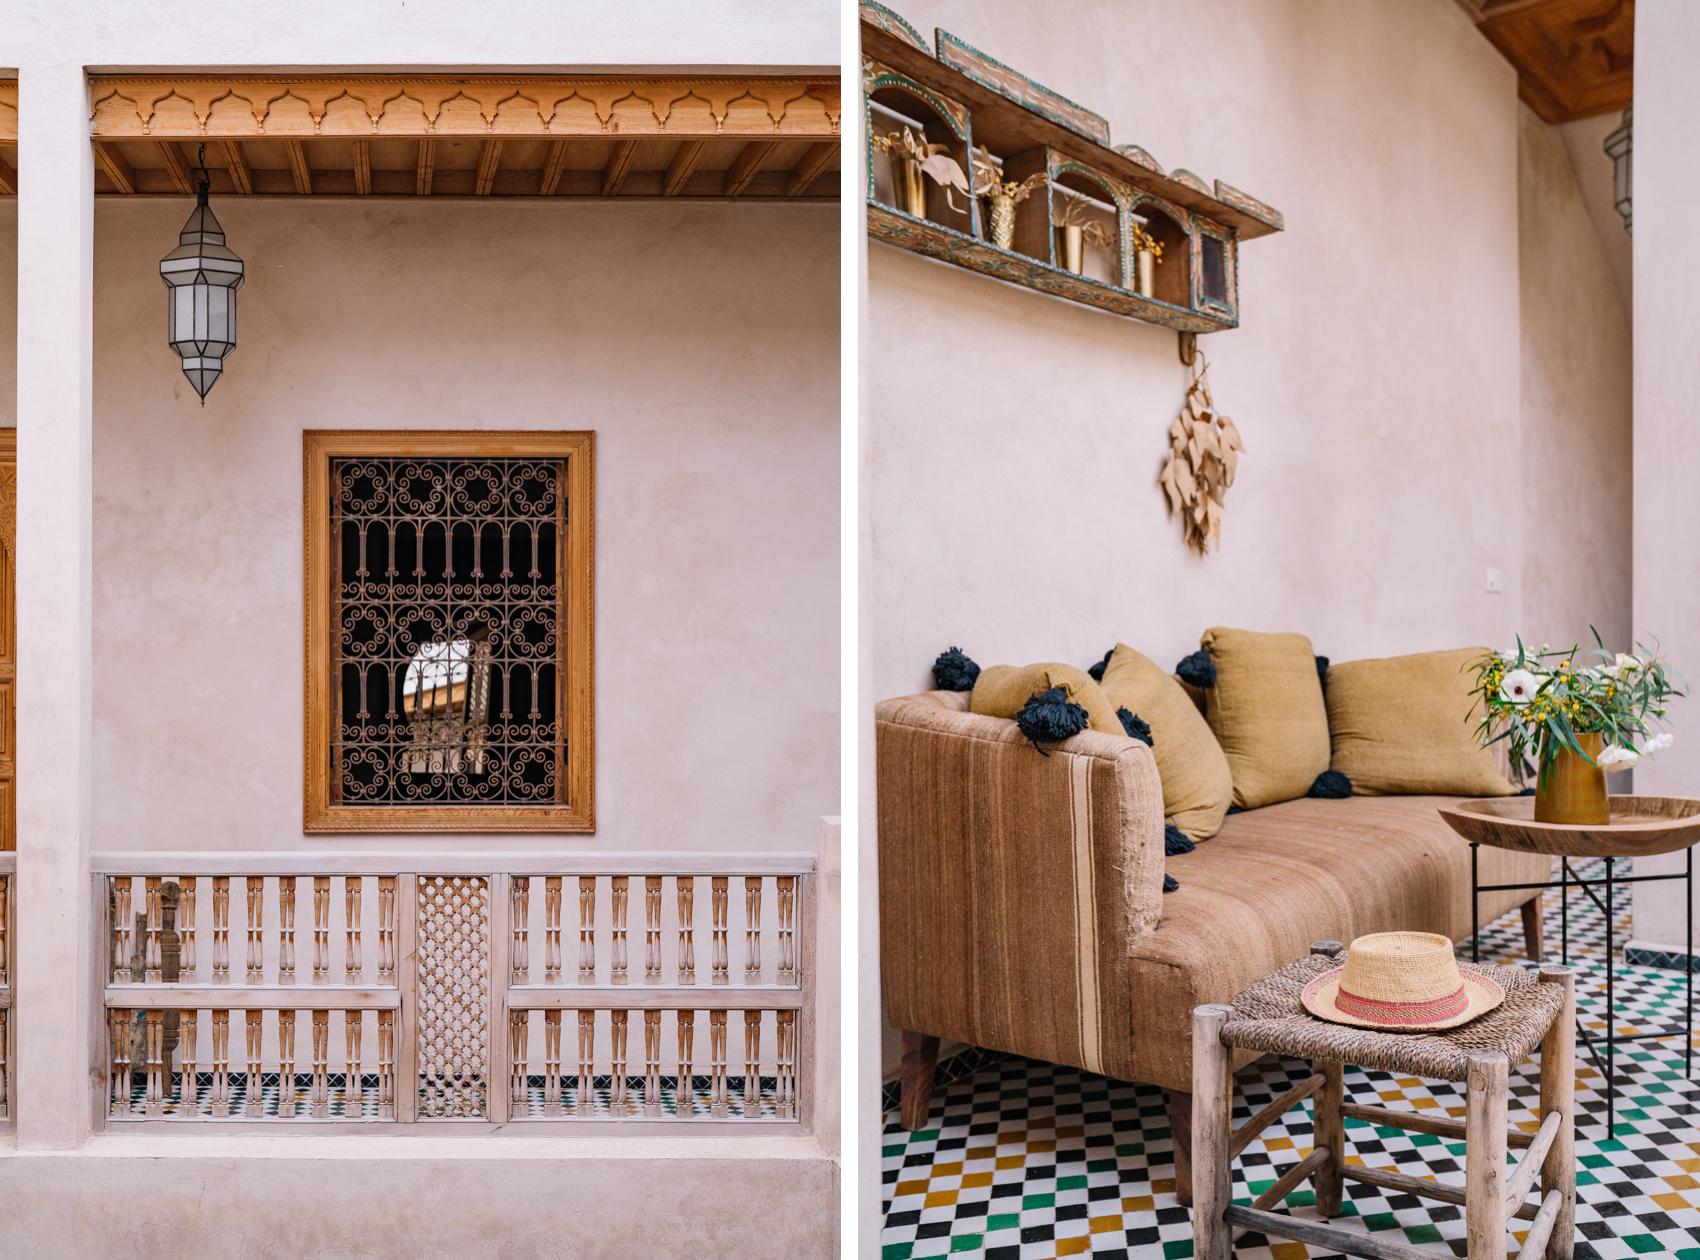 TRAVEL-Photography-lifestyle-Clara-Tuma_Morocco_001.jpg